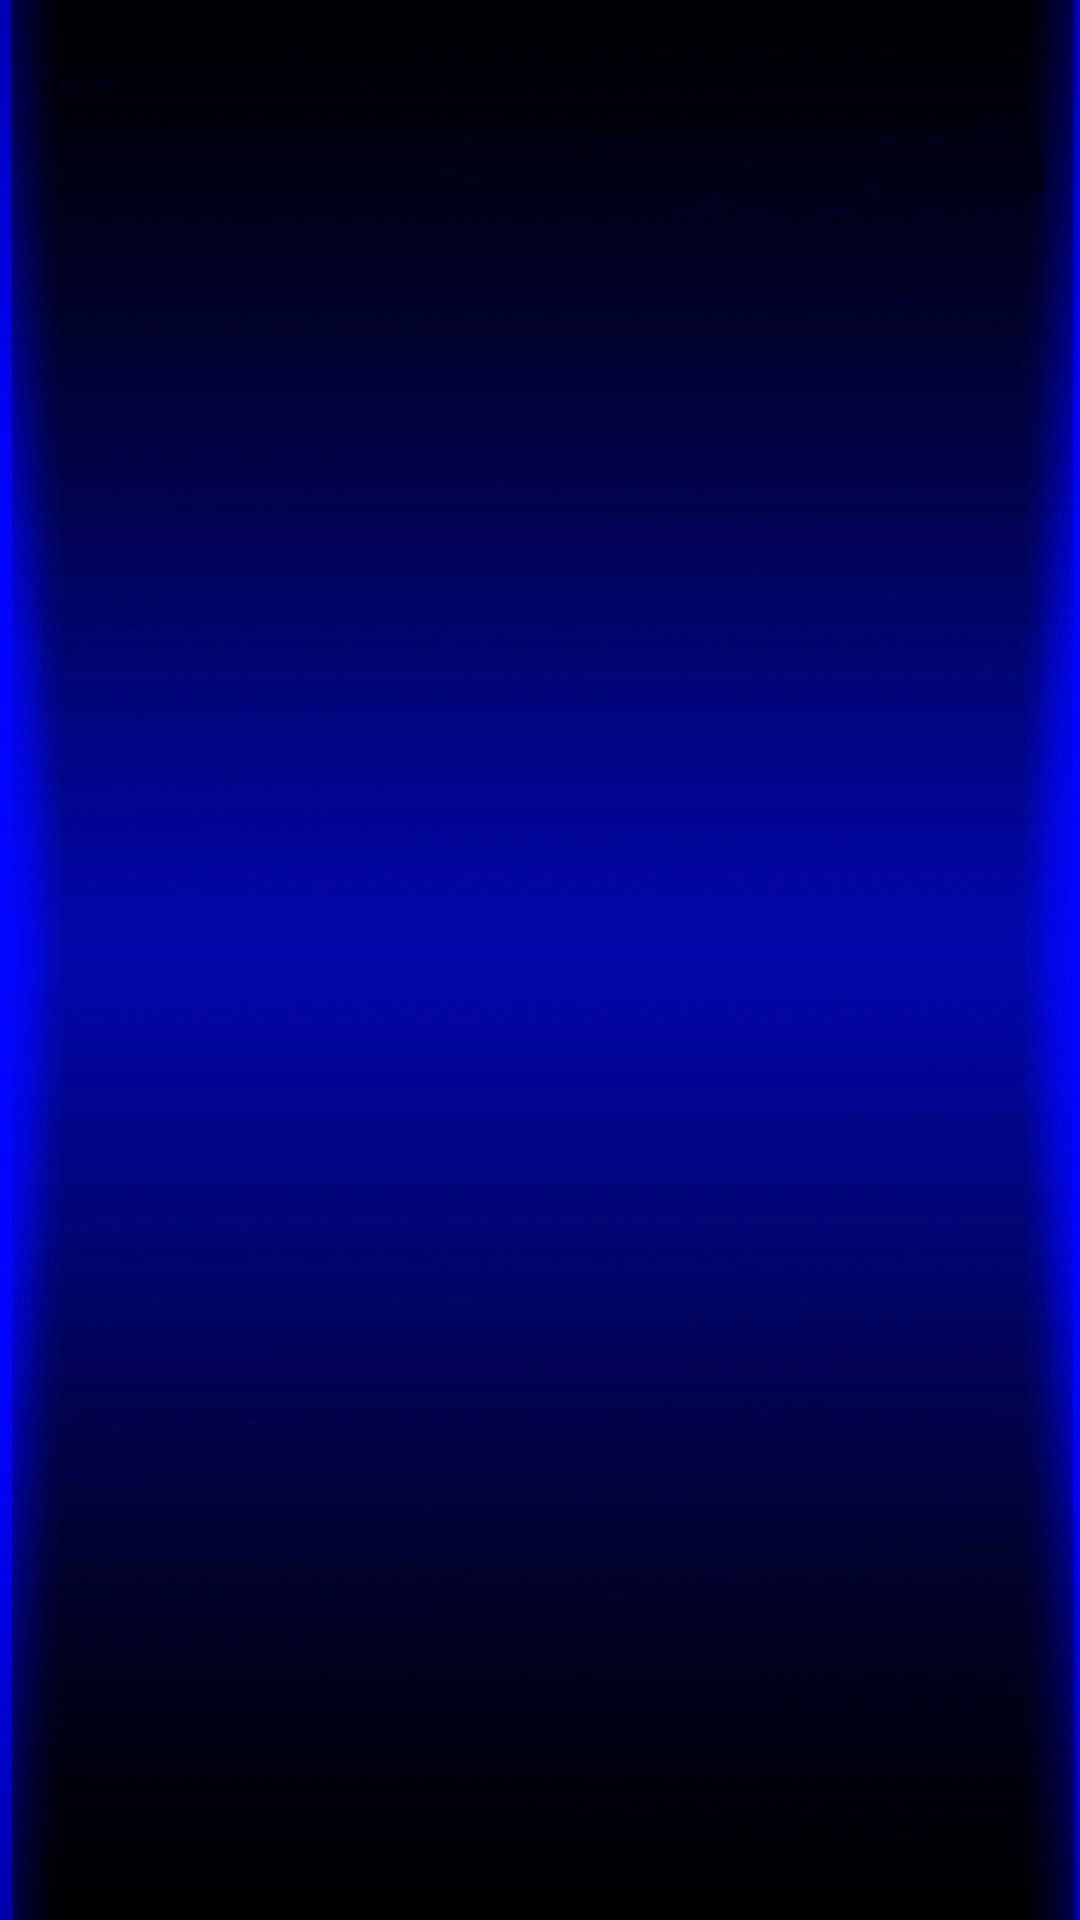 Edge Wallpaper Iphone 壁紙 青 1080x1920 Wallpaper Teahub Io